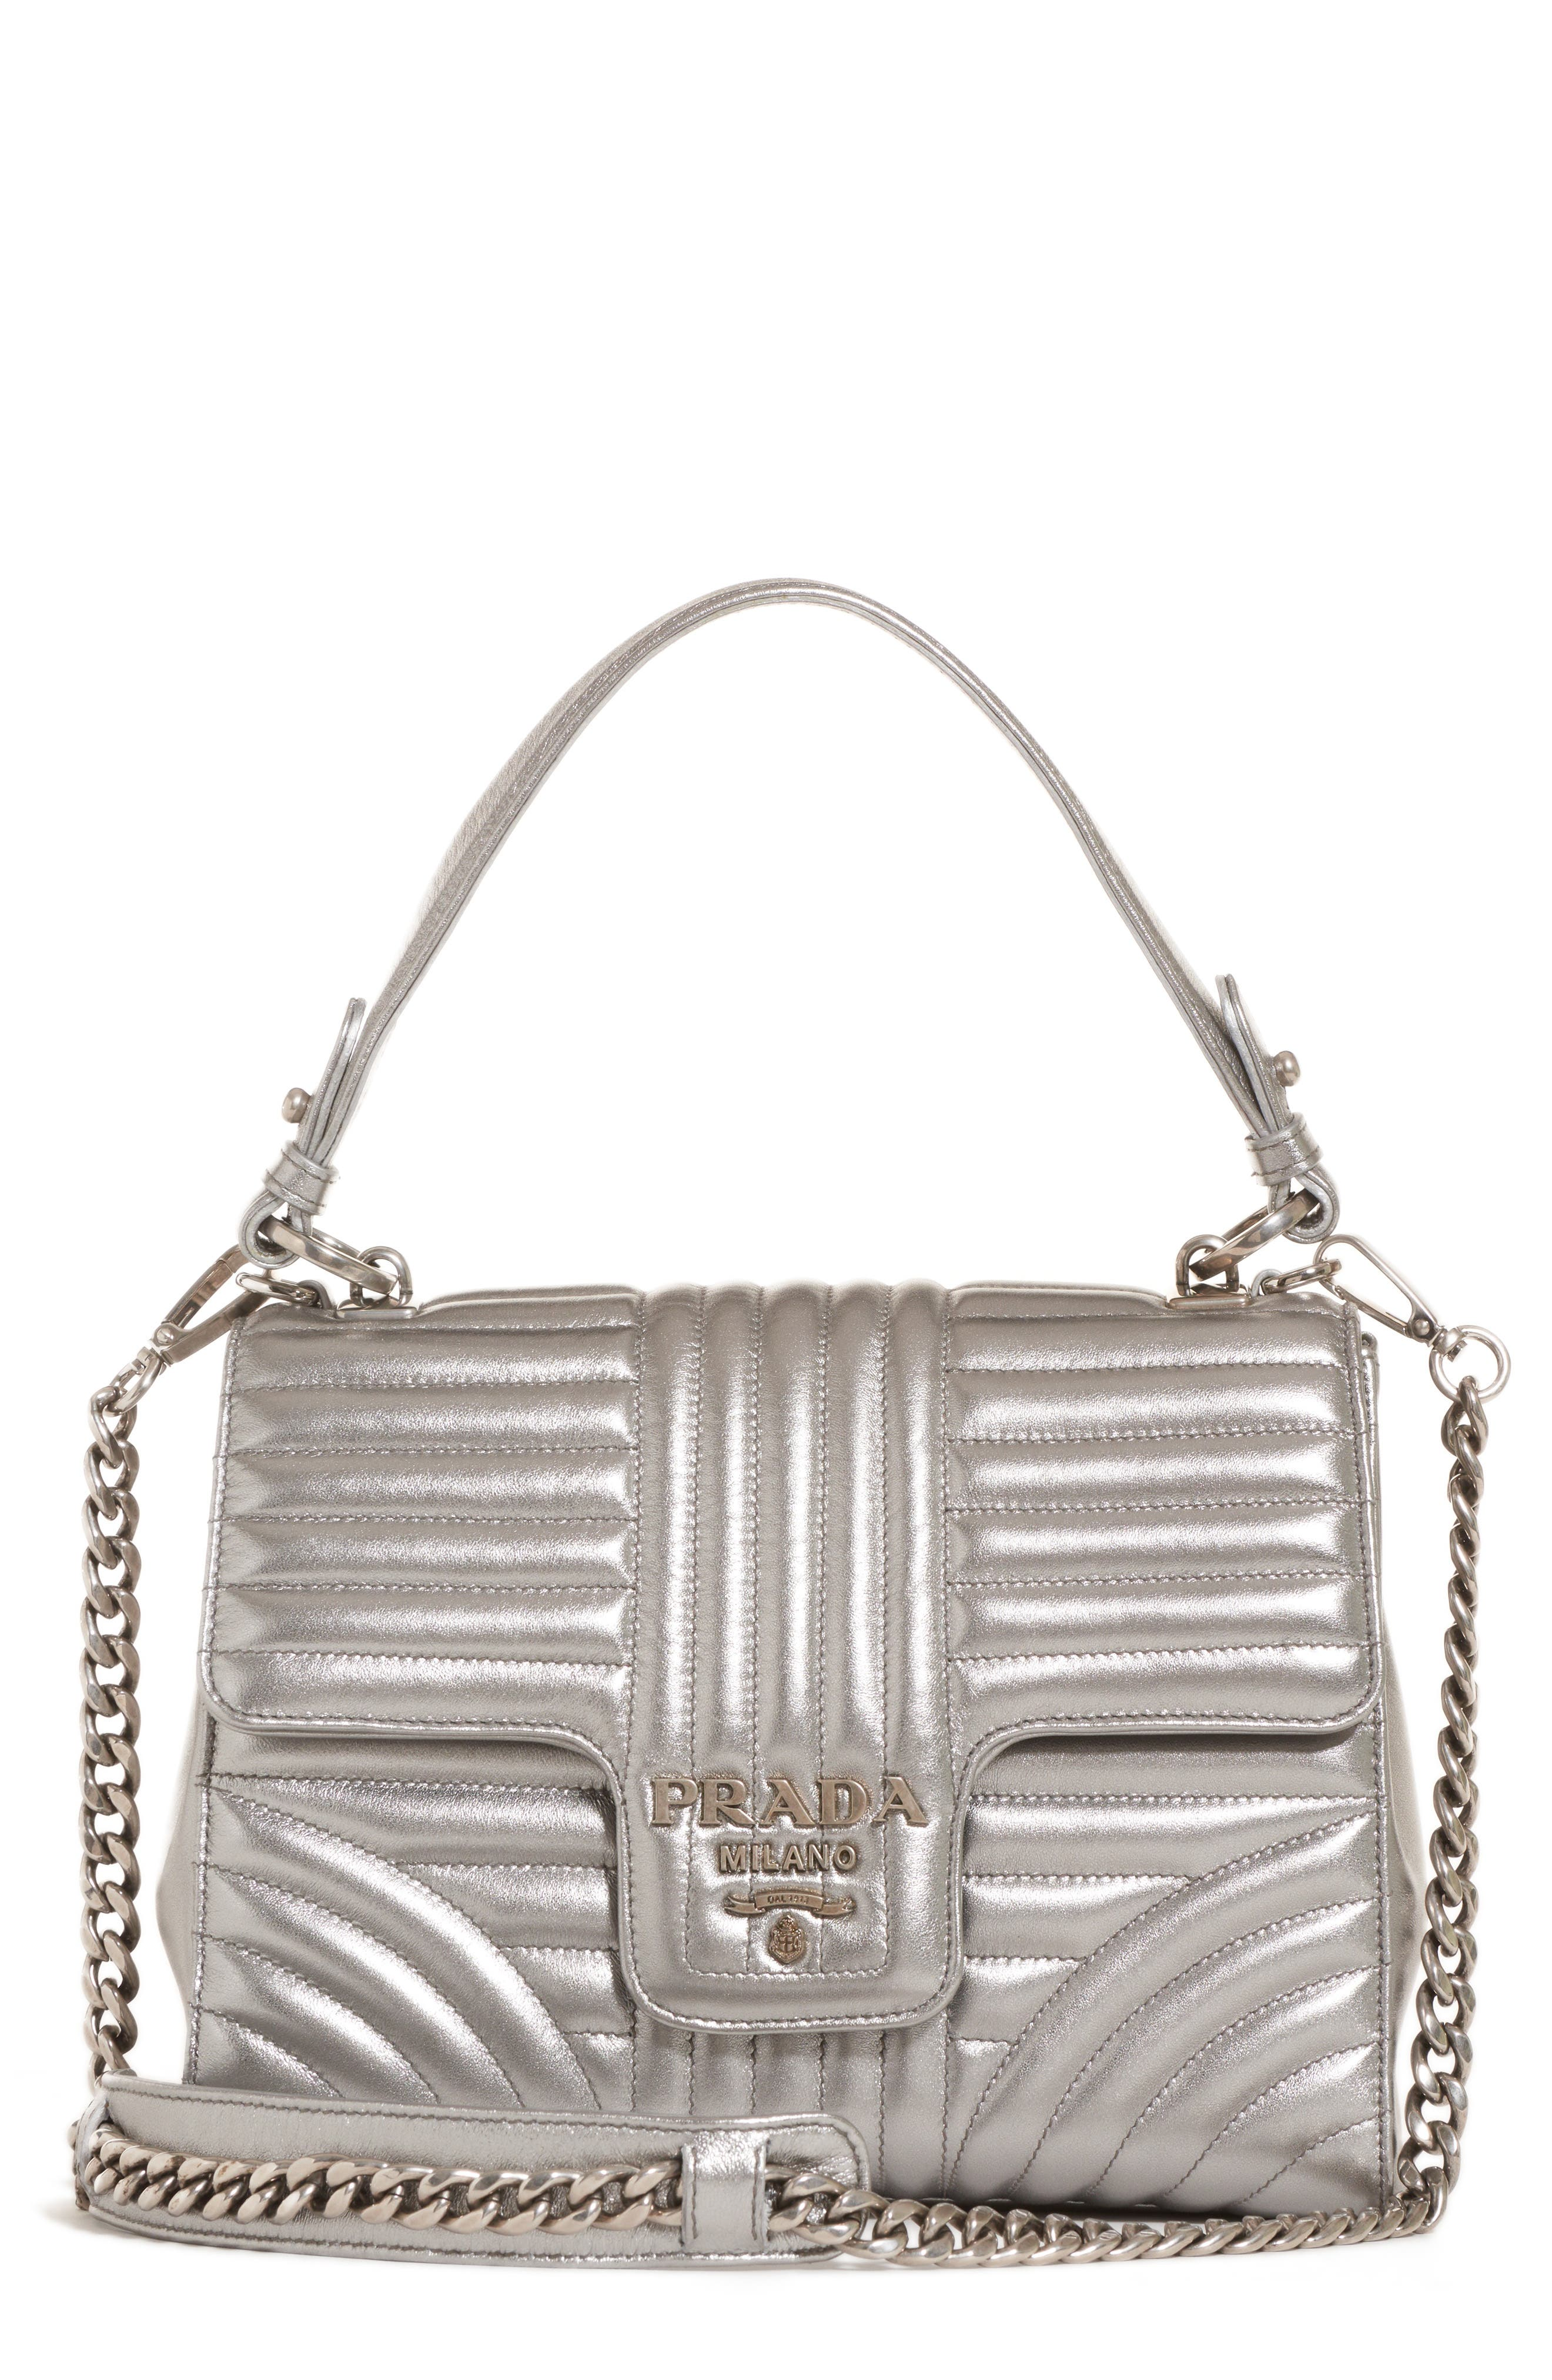 Quilted Metallic Lambskin Leather Handbag,                         Main,                         color, CROMO